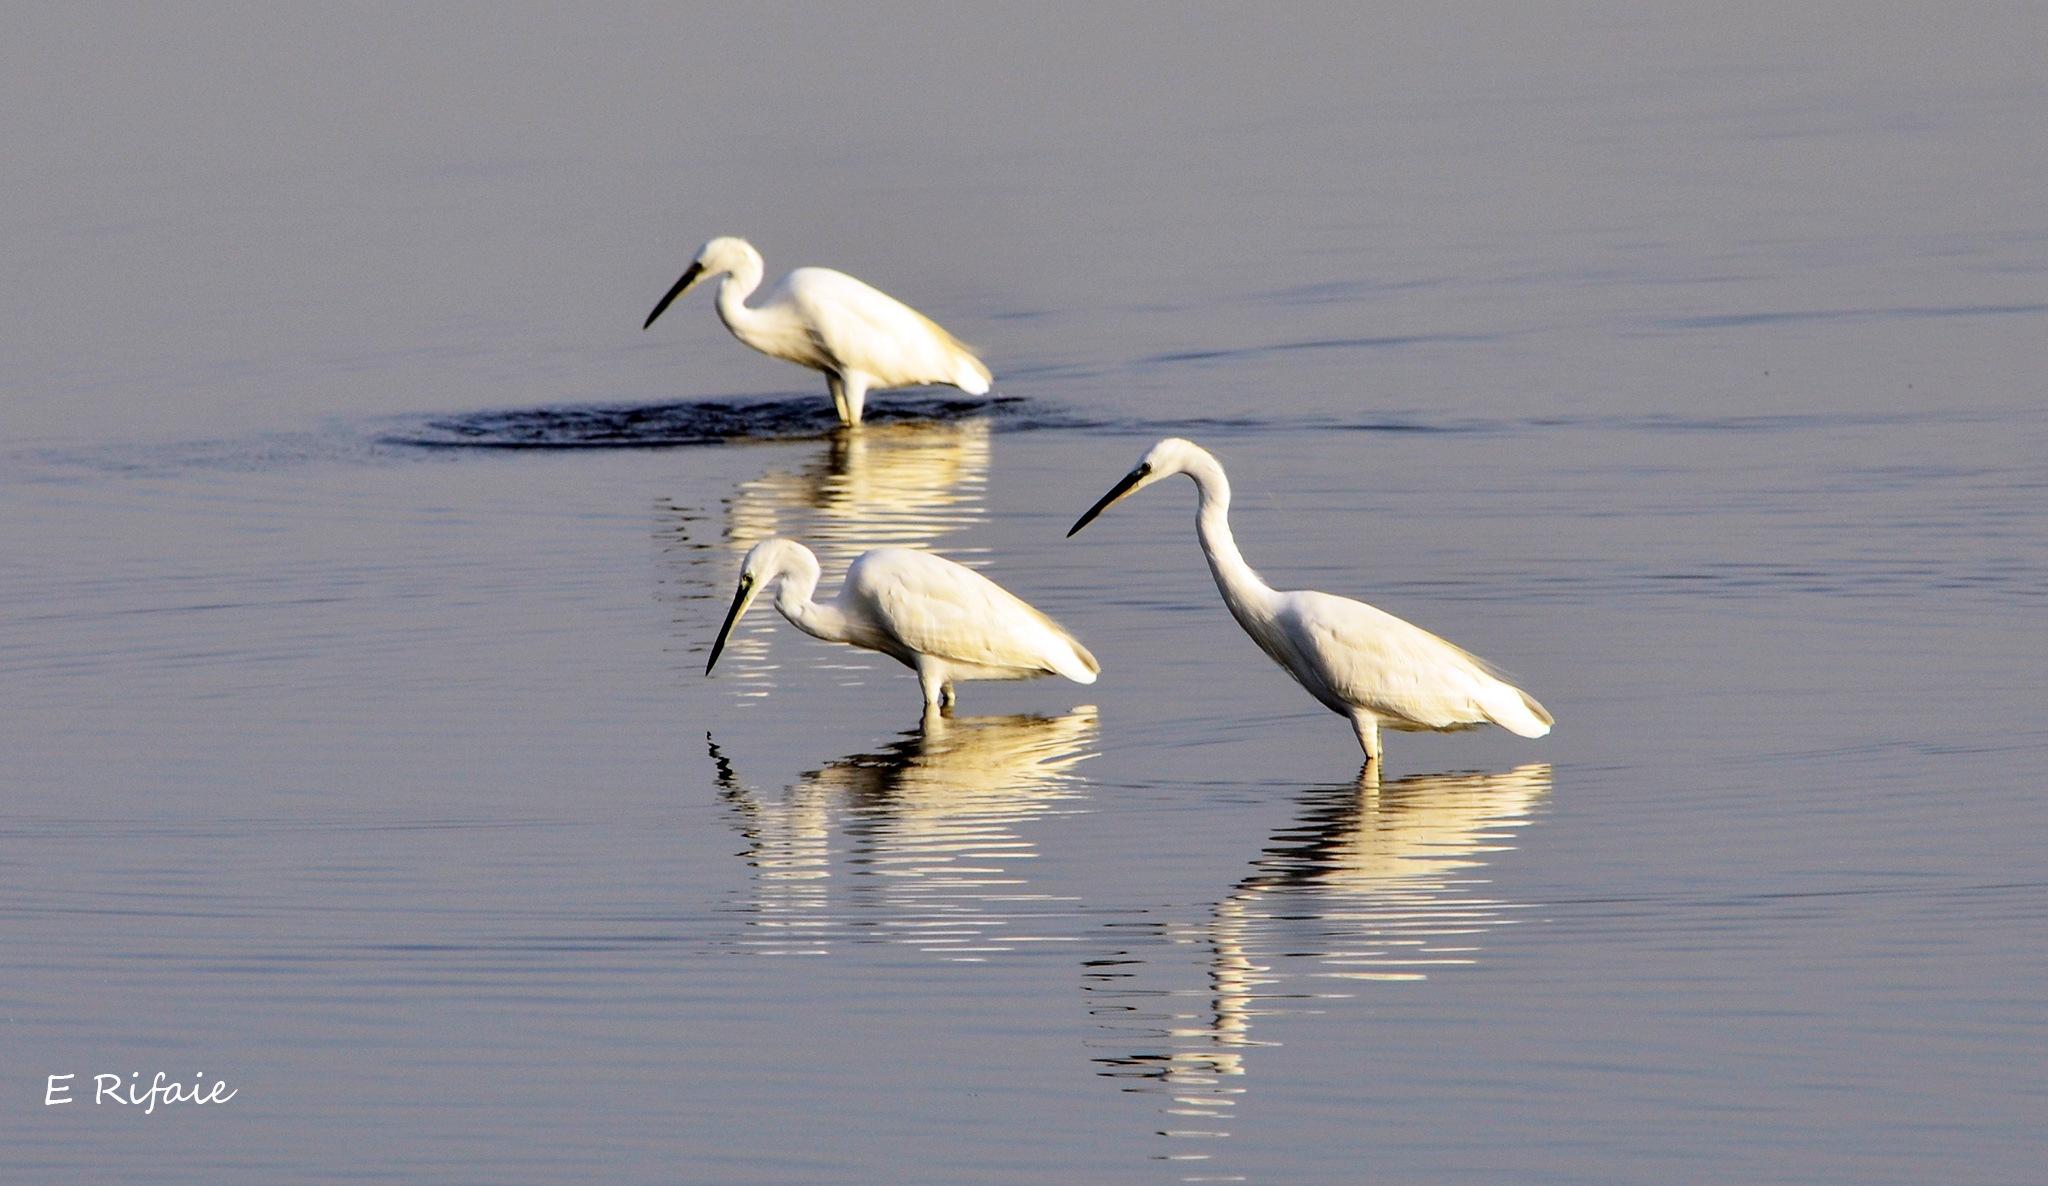 Three birds by Emad Eldin Moustafa El Refaie